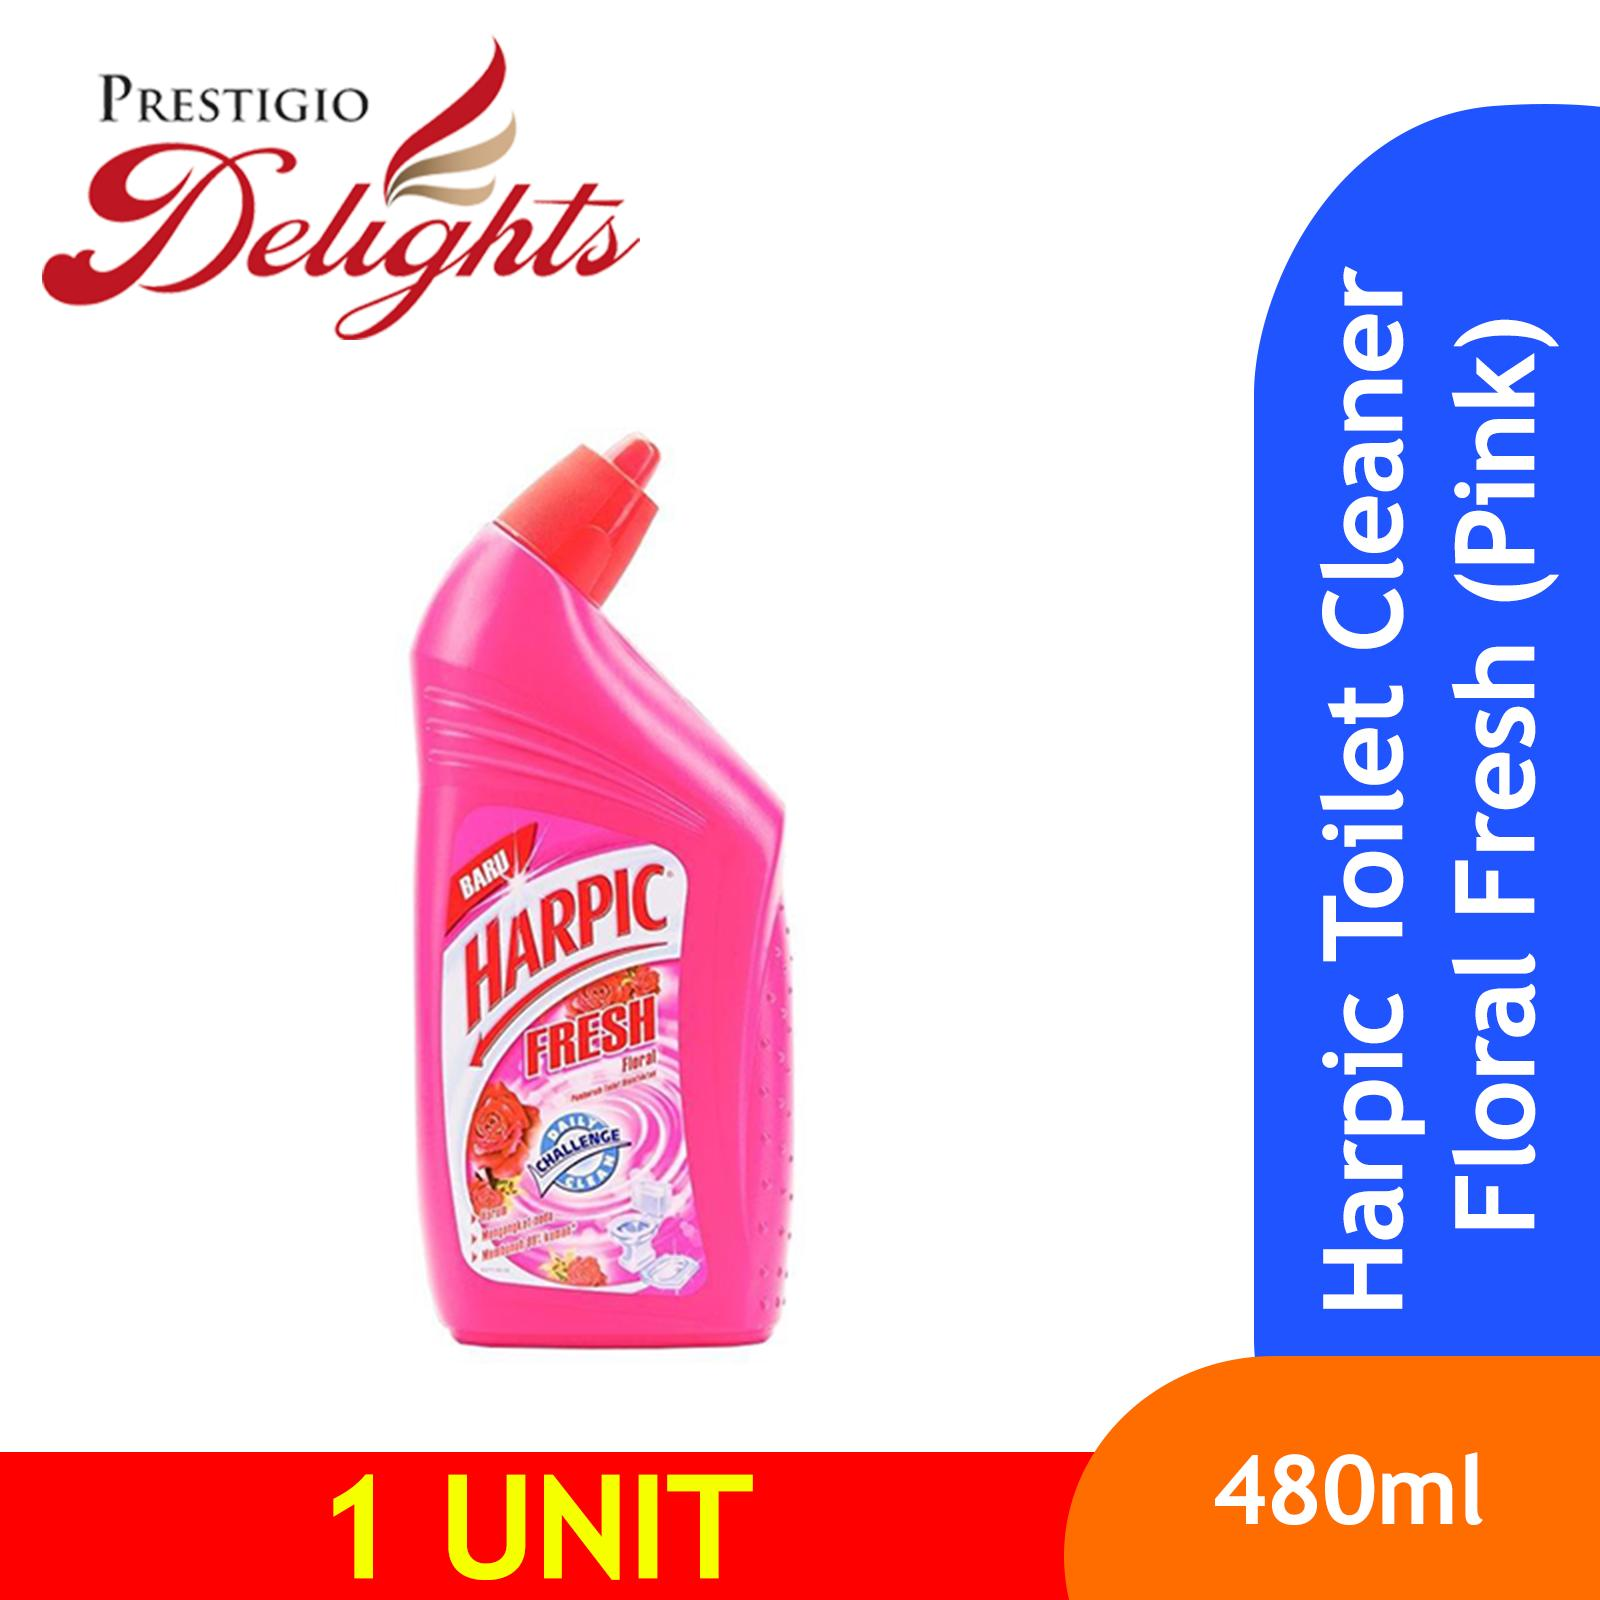 Harpic Toilet Cleaner Floral Fresh (pink) 450ml By Prestigio Delights.